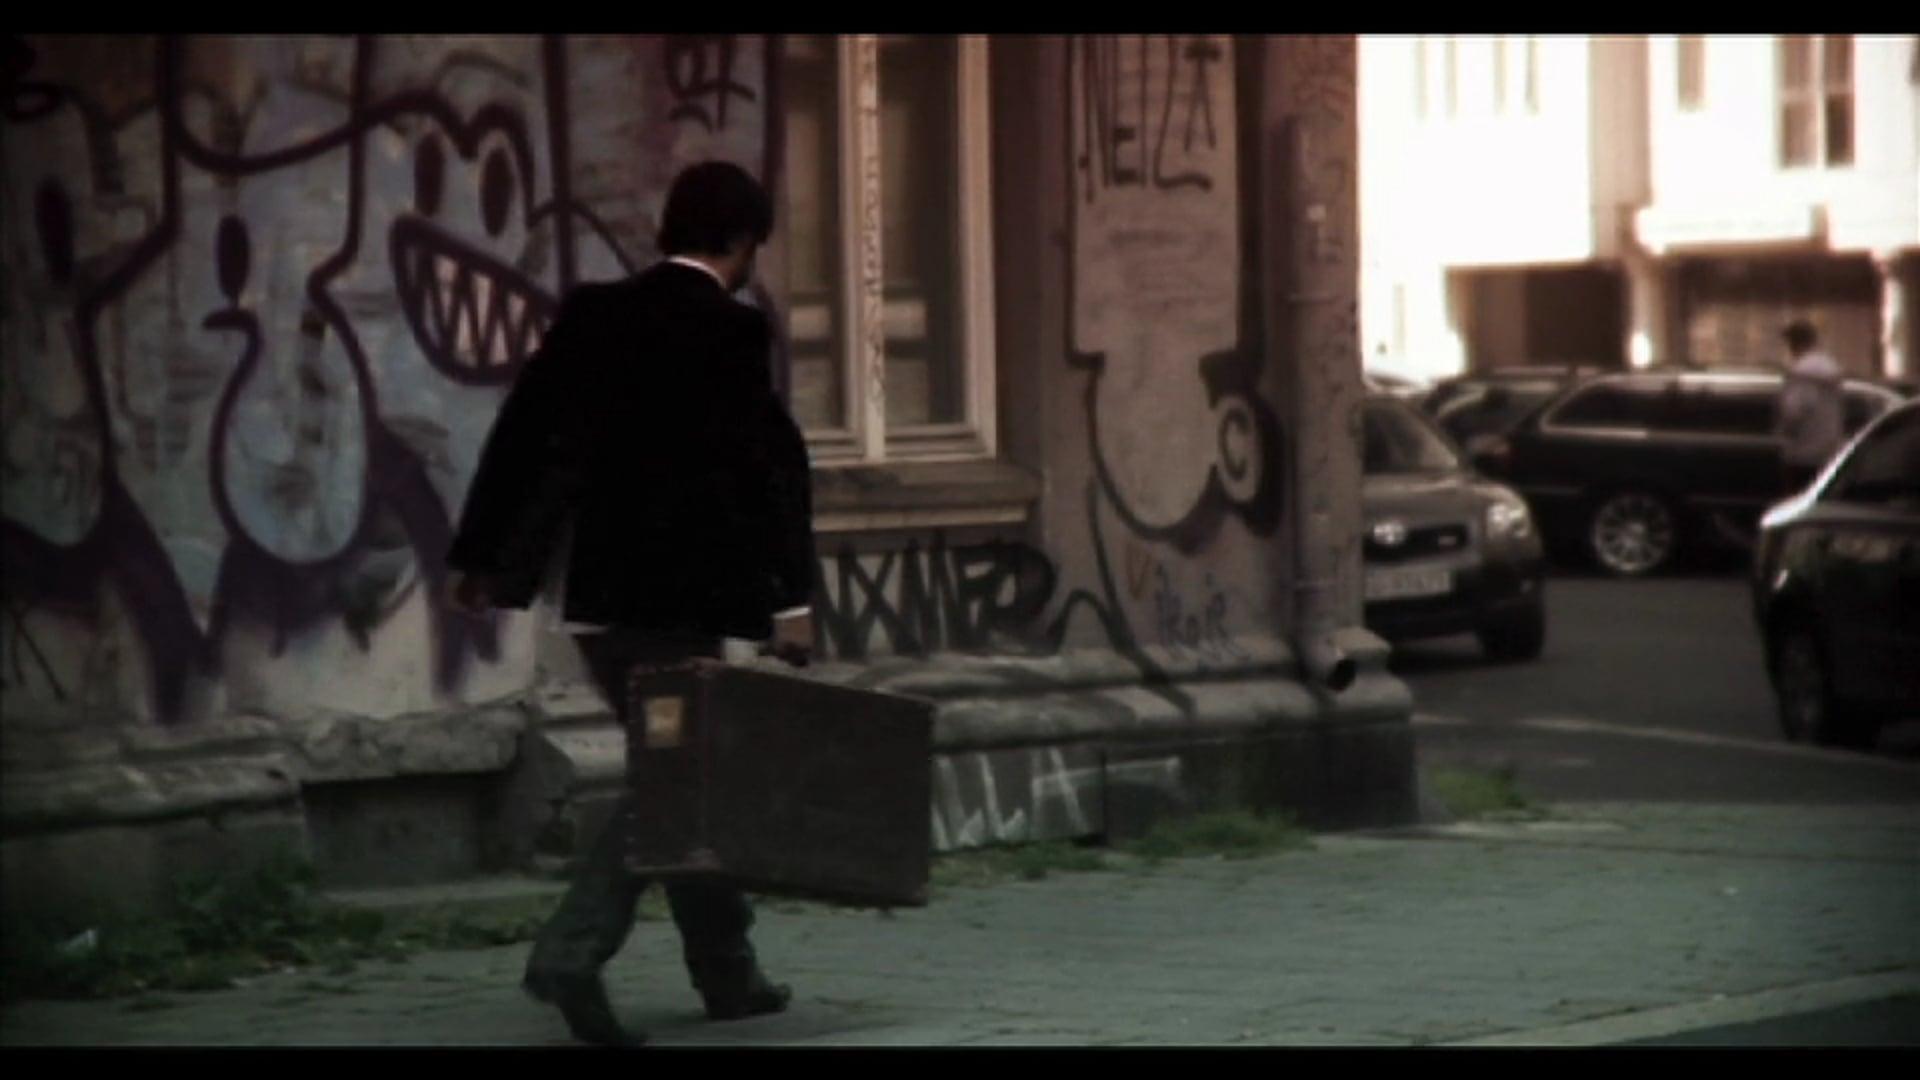 Kite - The Baggage